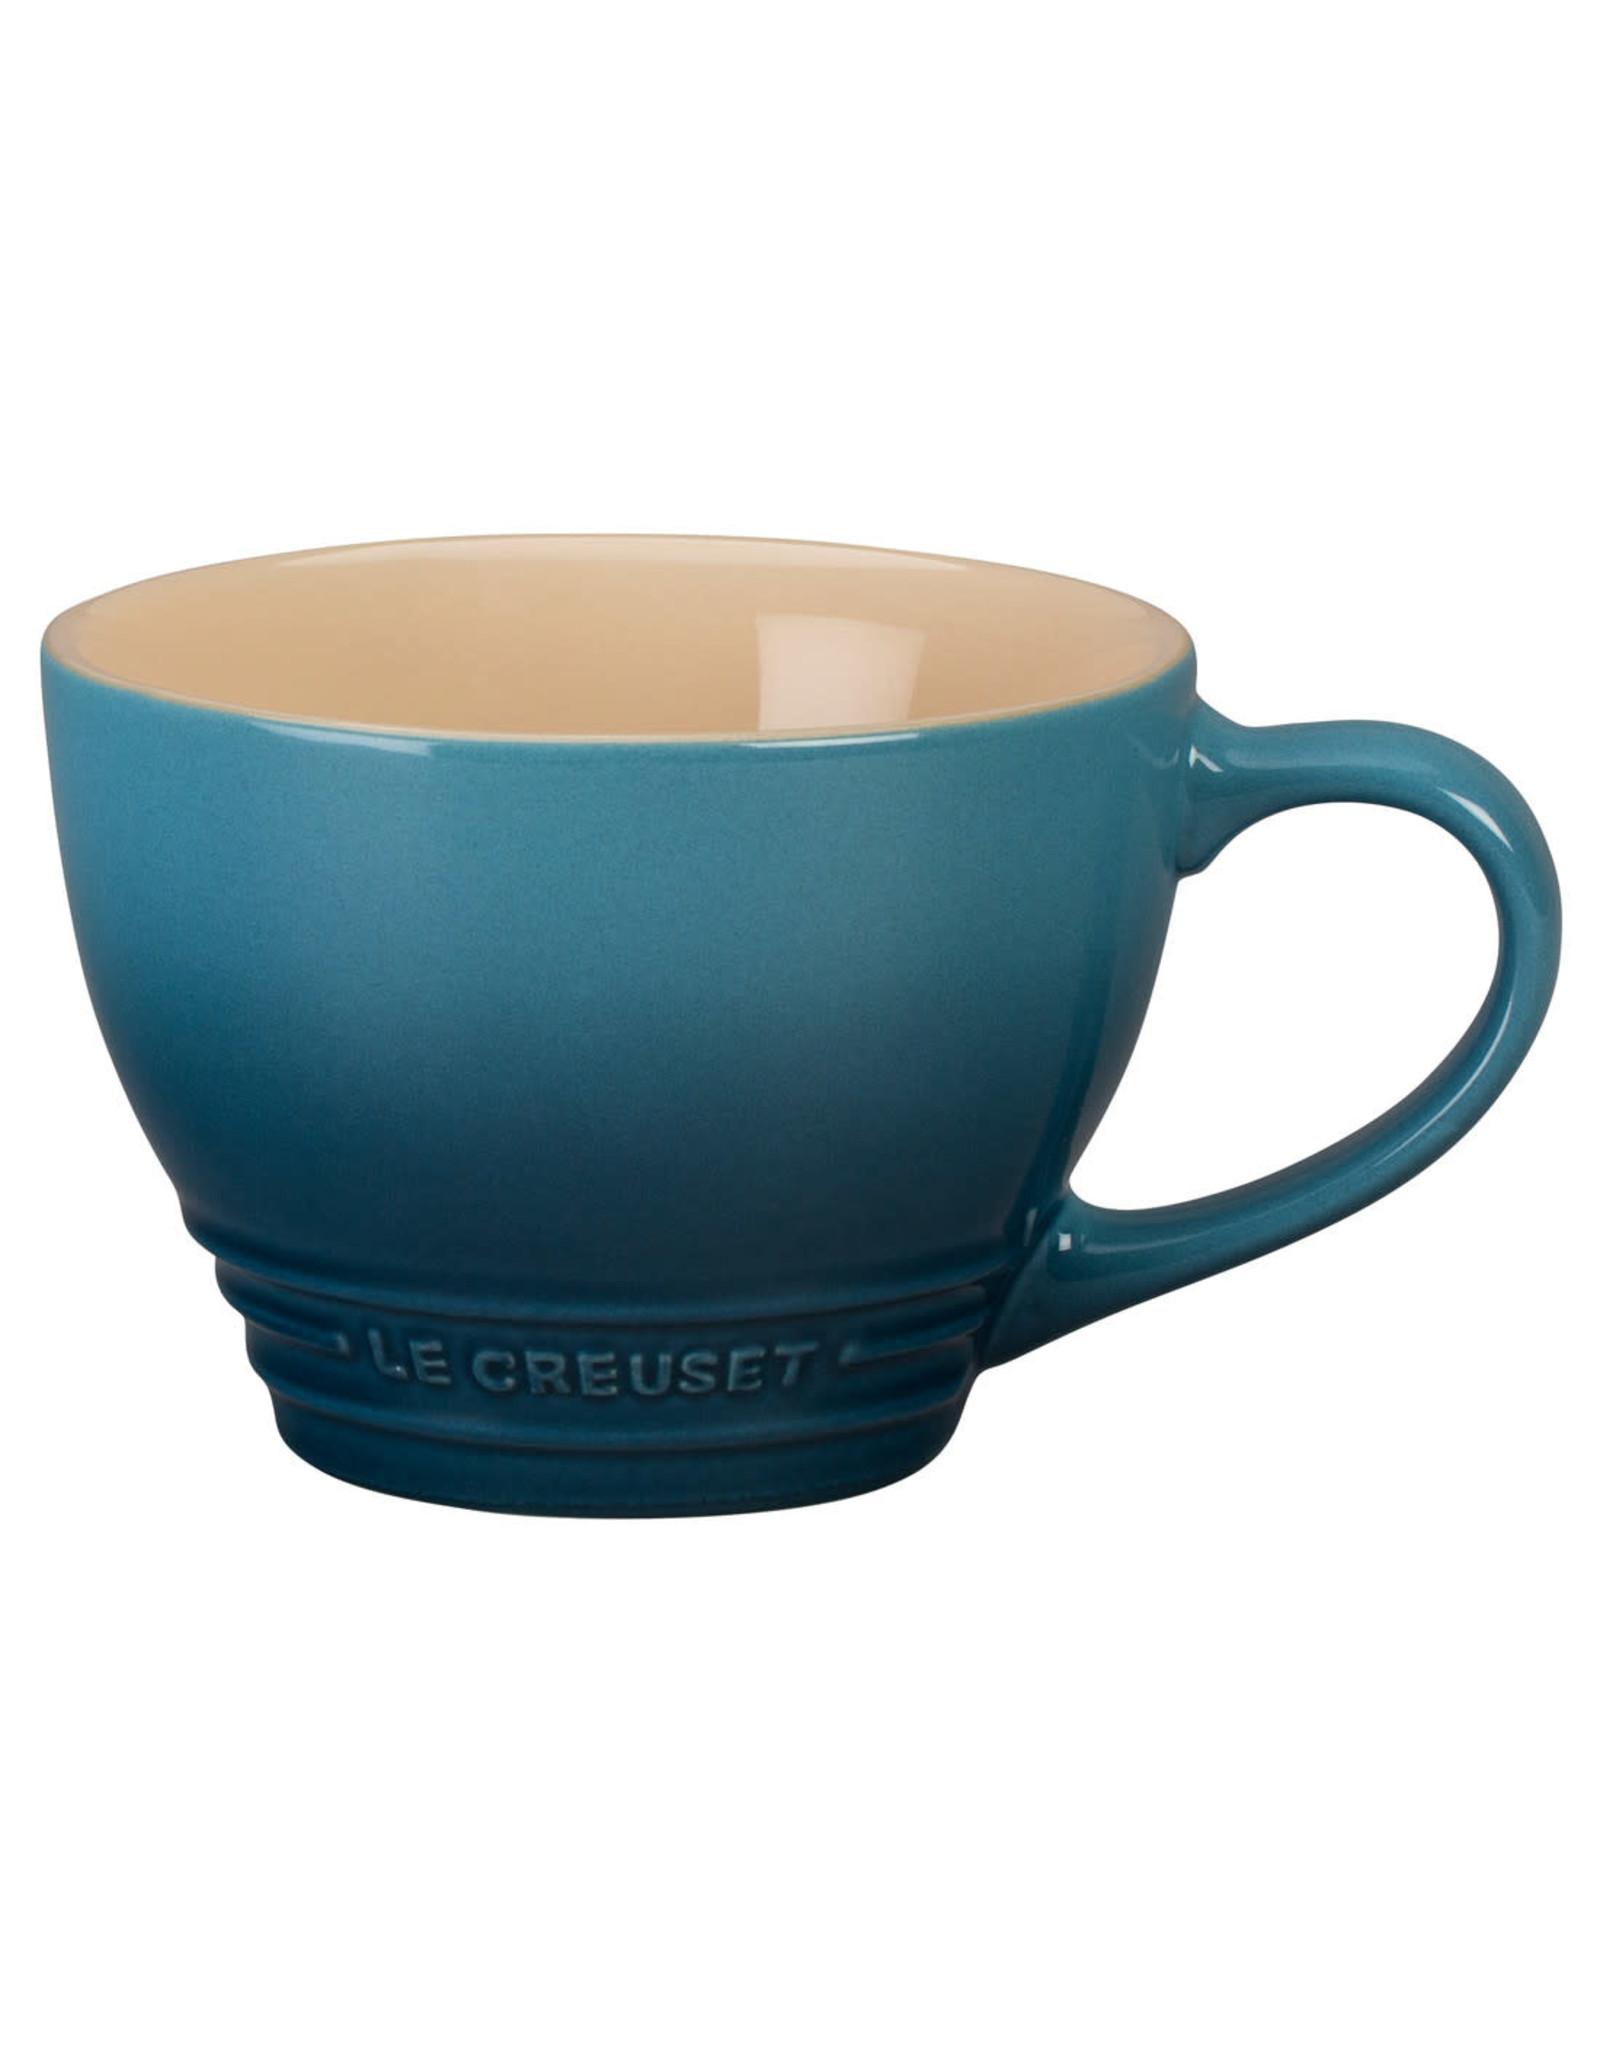 Le Creuset Le Creuset Bistro Mug - Marine